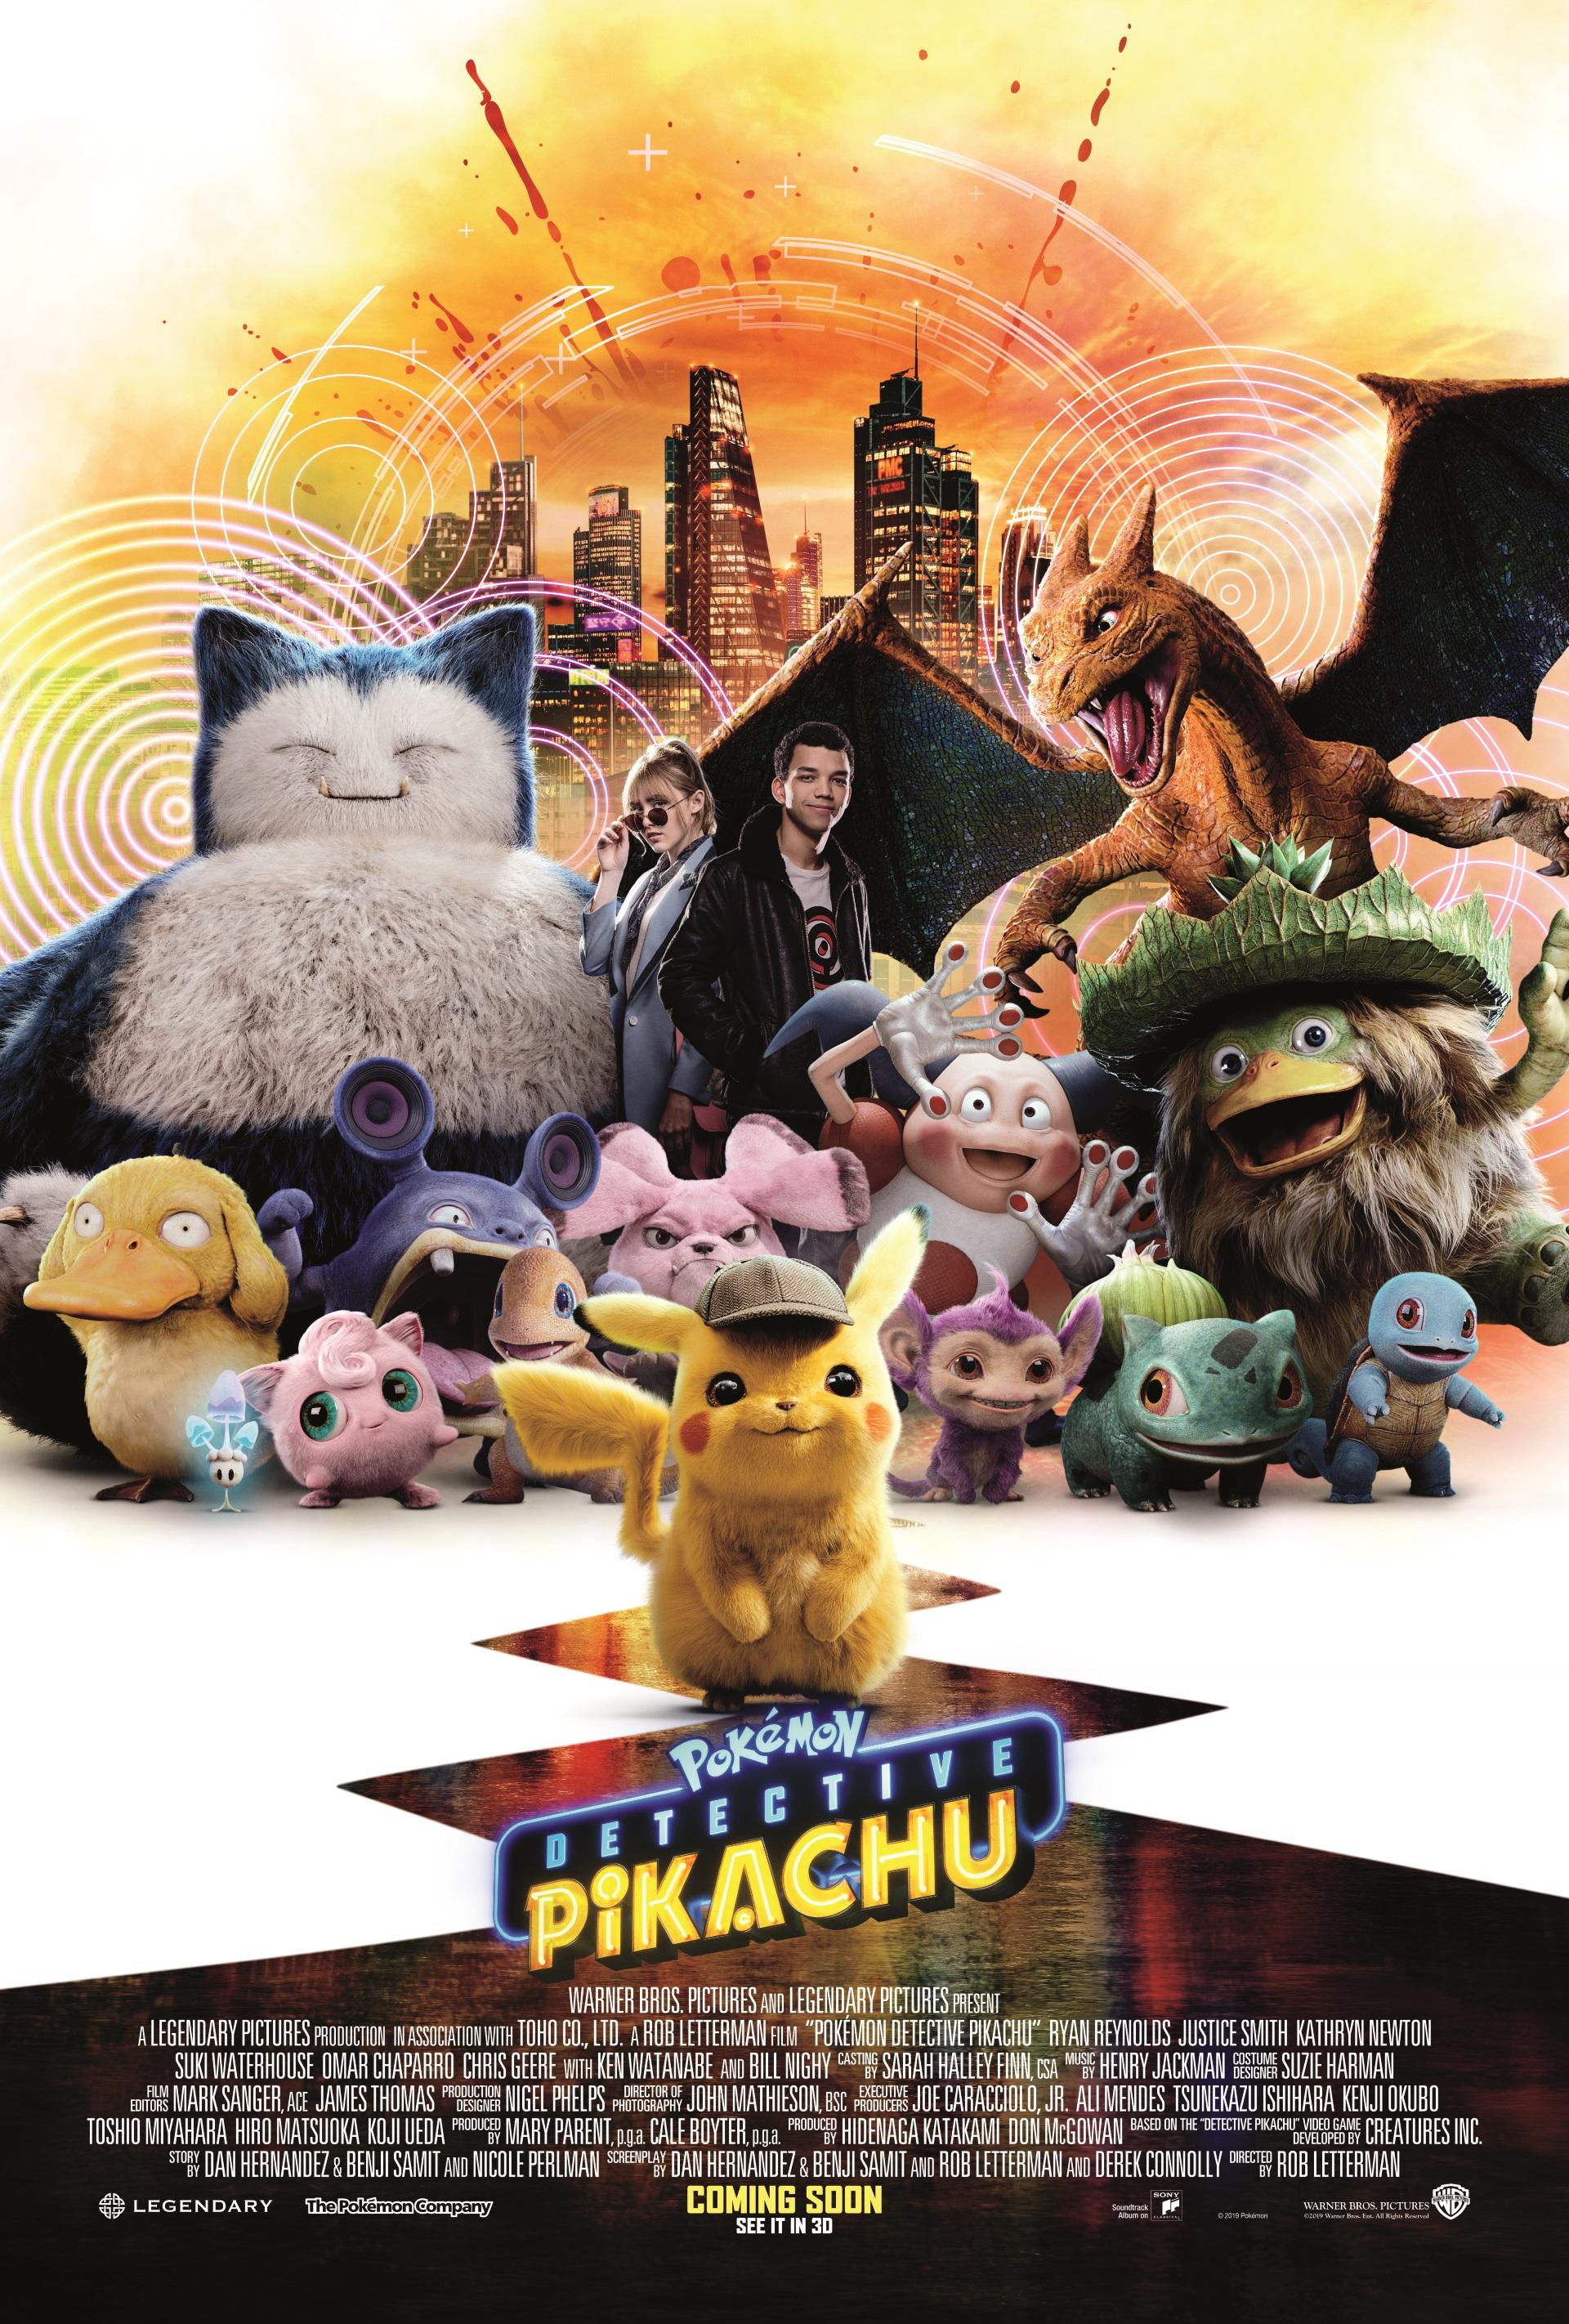 detective pikachu poster.jpg